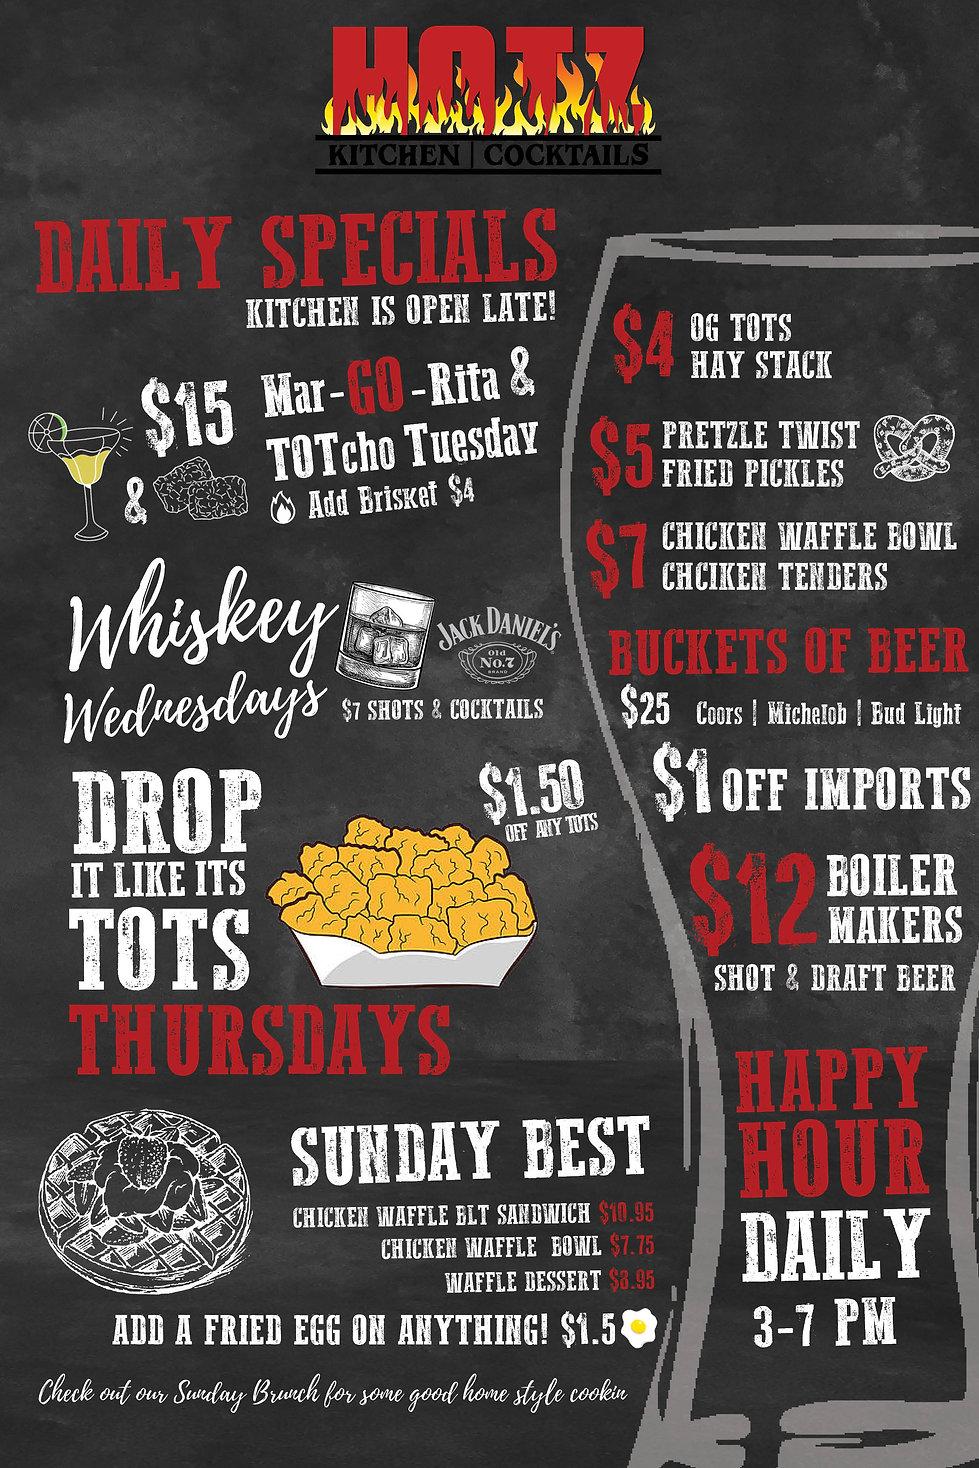 Hotz Kitchen & Cocktails Specials Menu - Downtown Riverside, CA